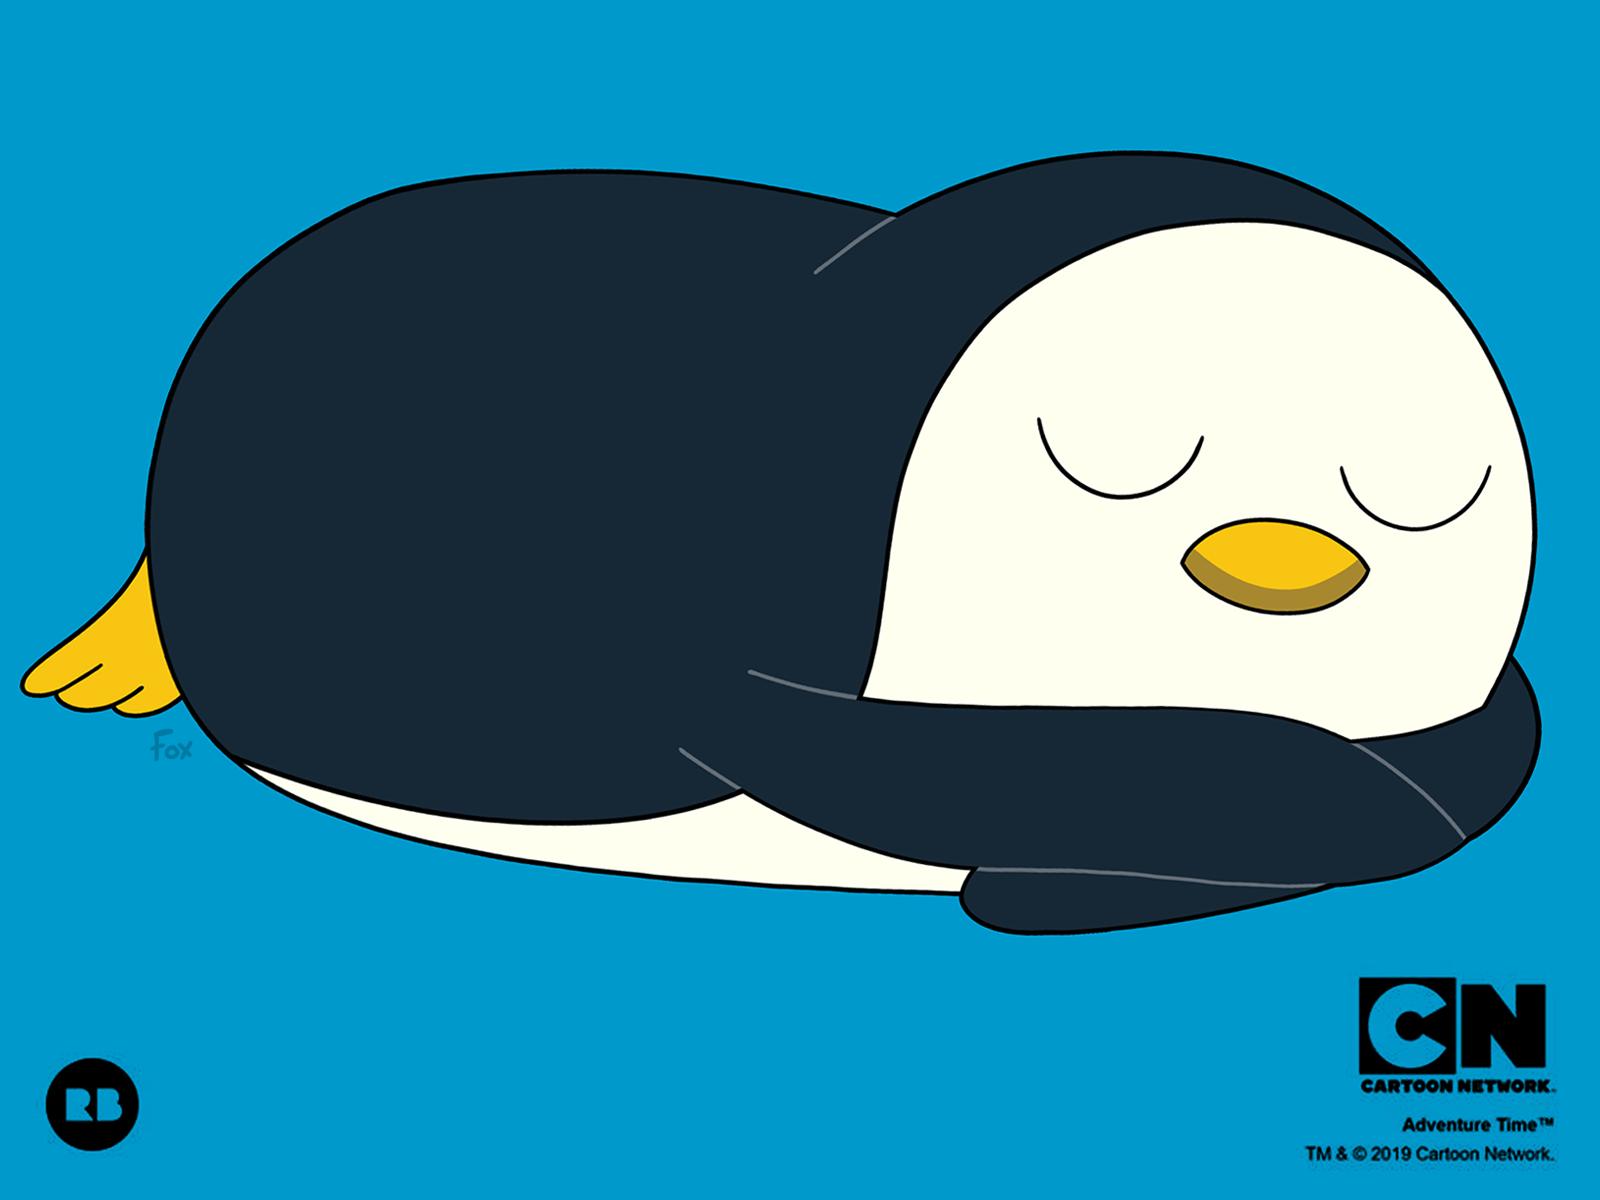 Sleepy Gunter The Penguin By Charley Fox On Dribbble